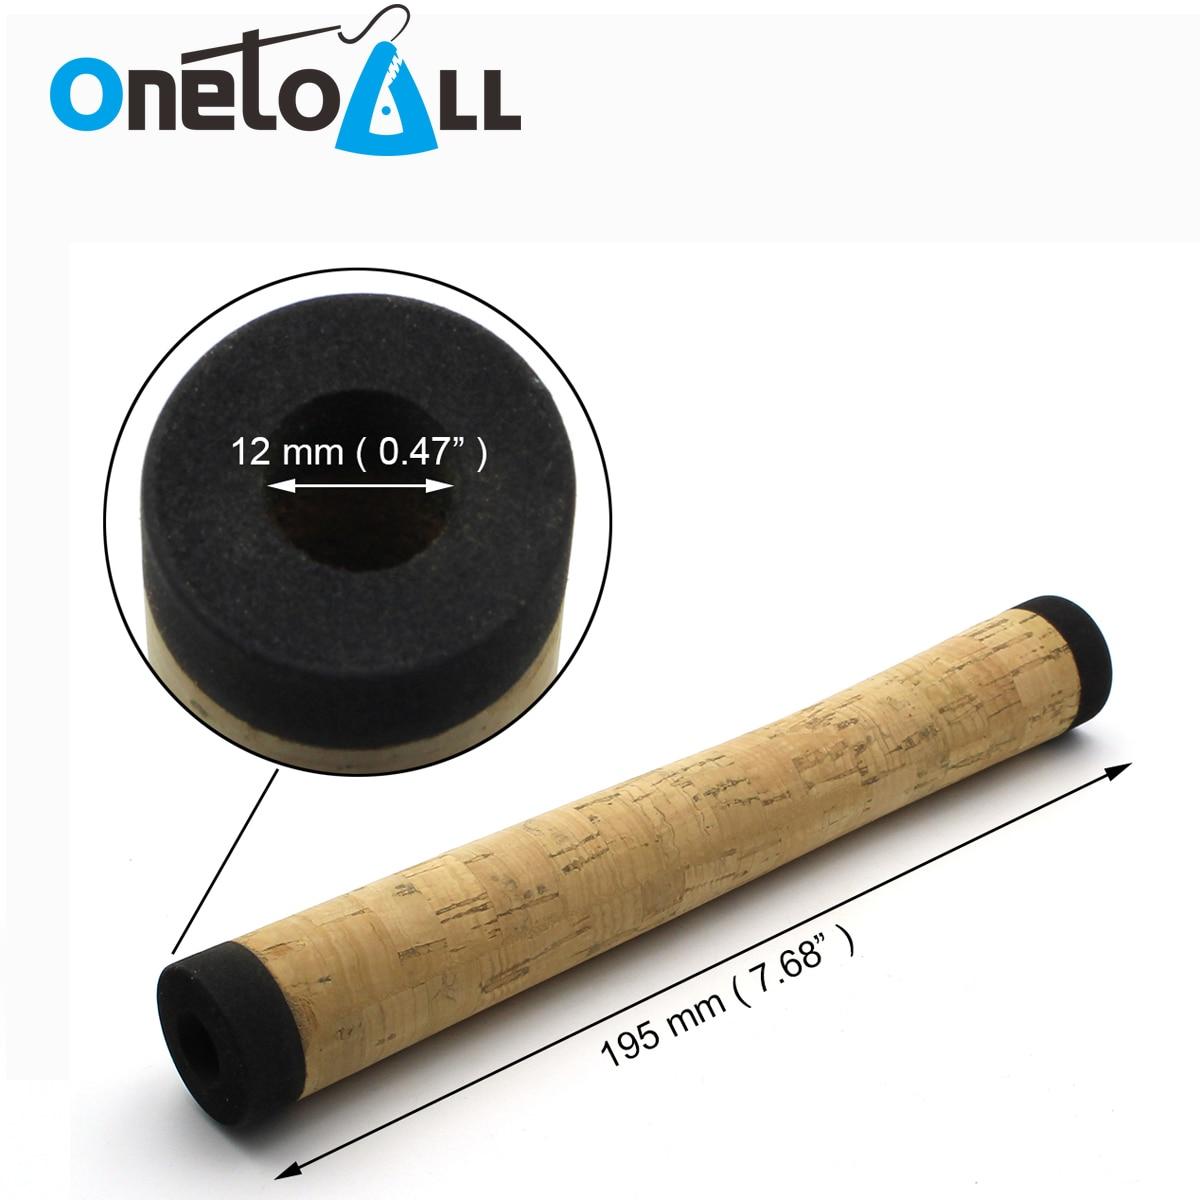 OnetoAll 10 PCs Fishing Rod Handle Composite Cork Grip DIY Fishing Pole Repair Kits Ultra Light Portable Spinning Fishing Rod enlarge